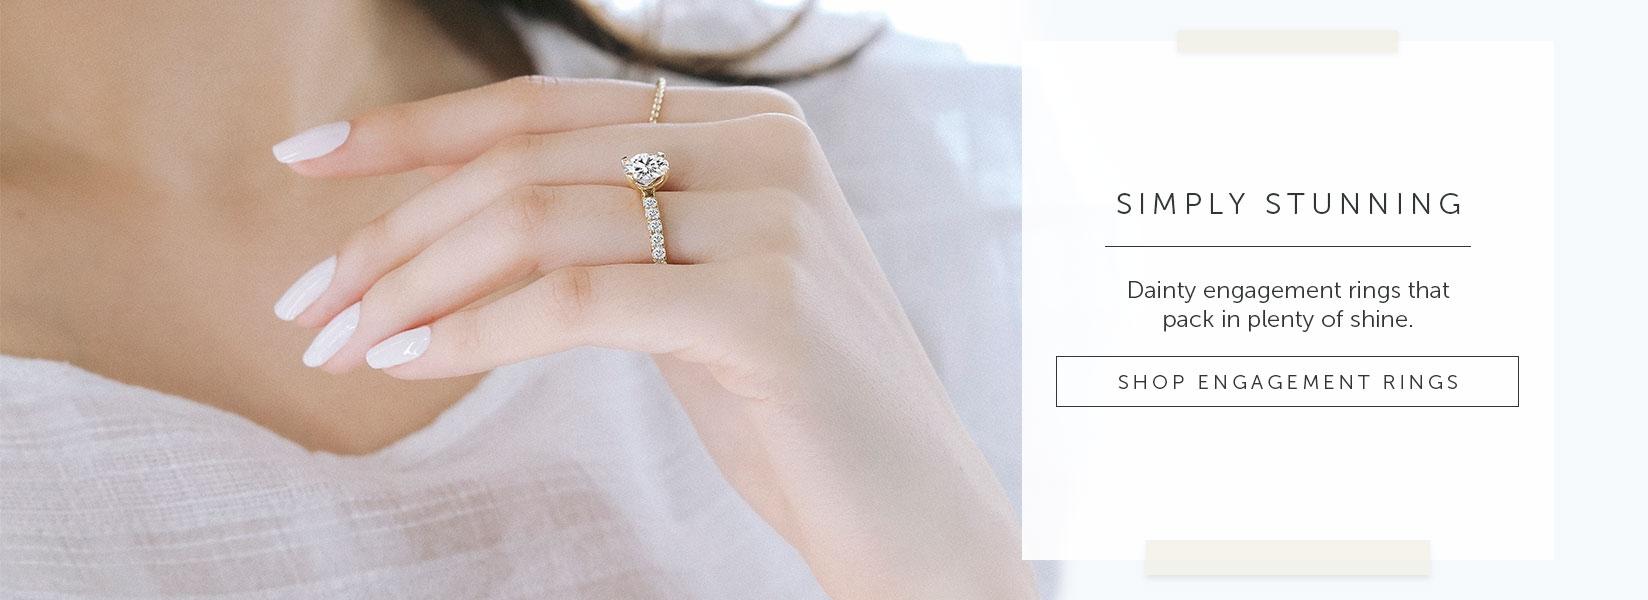 Shop engagment ring